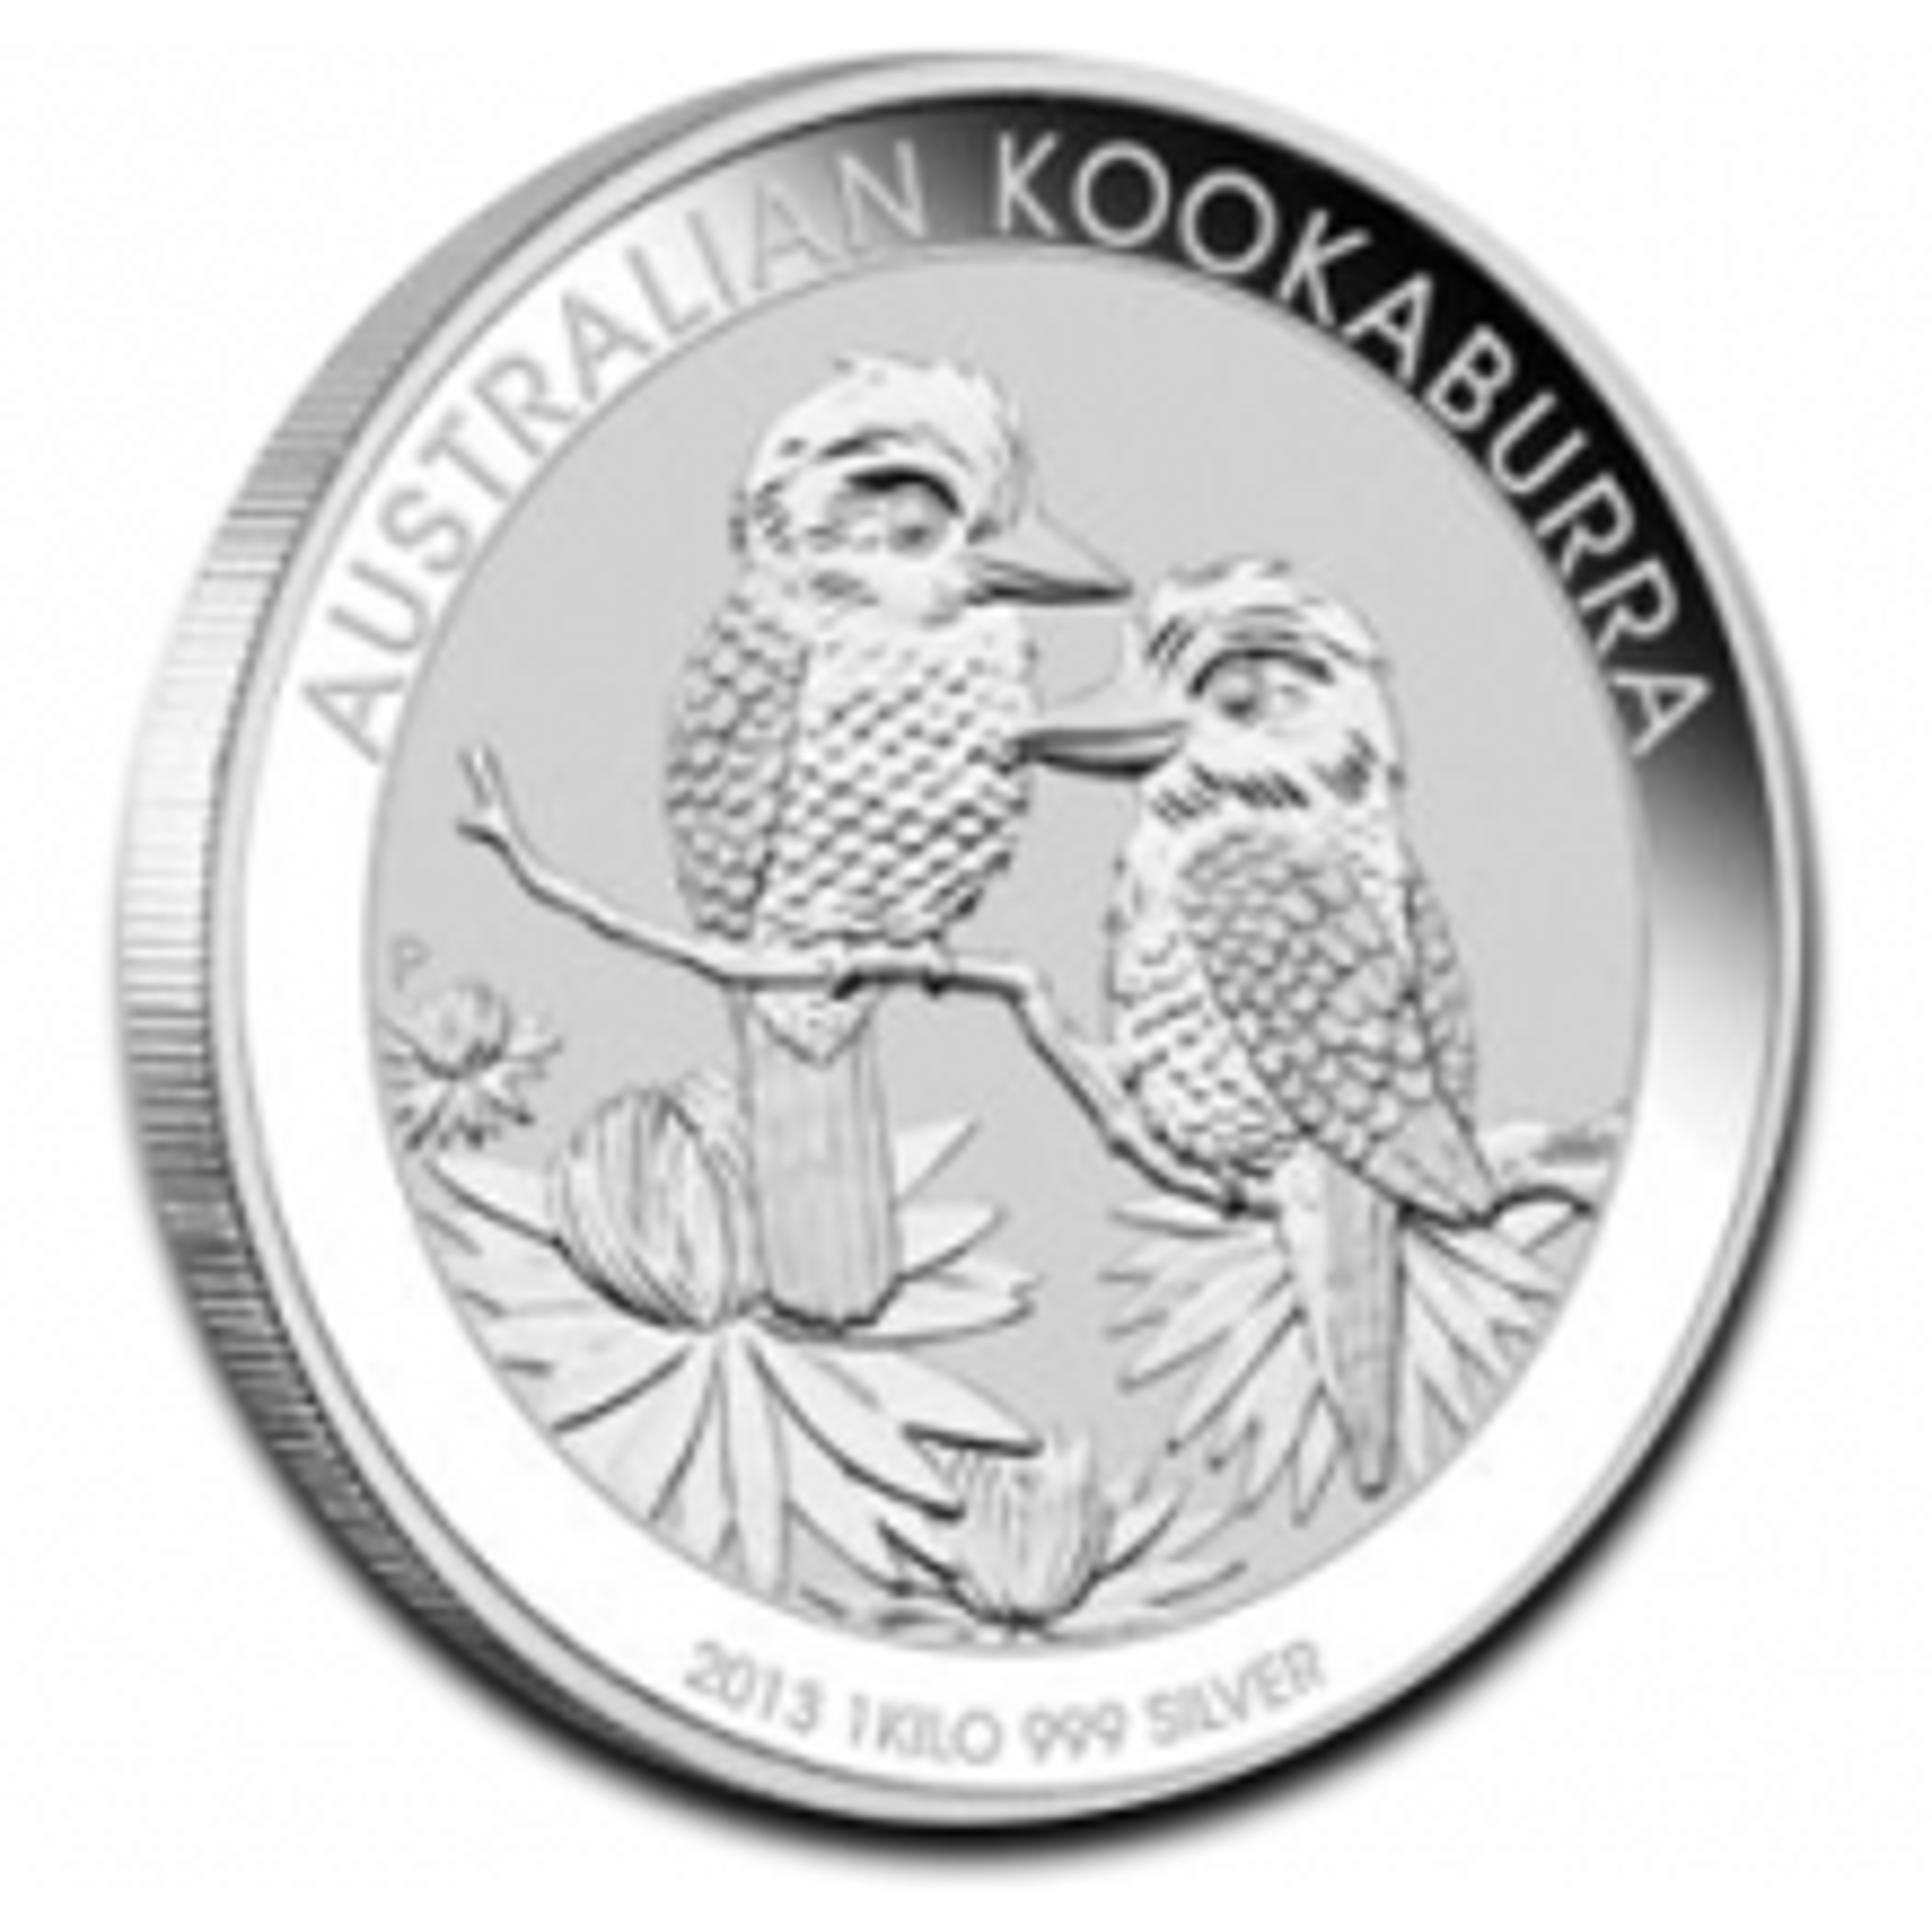 1 Kilo Kookaburra silver coin 2013